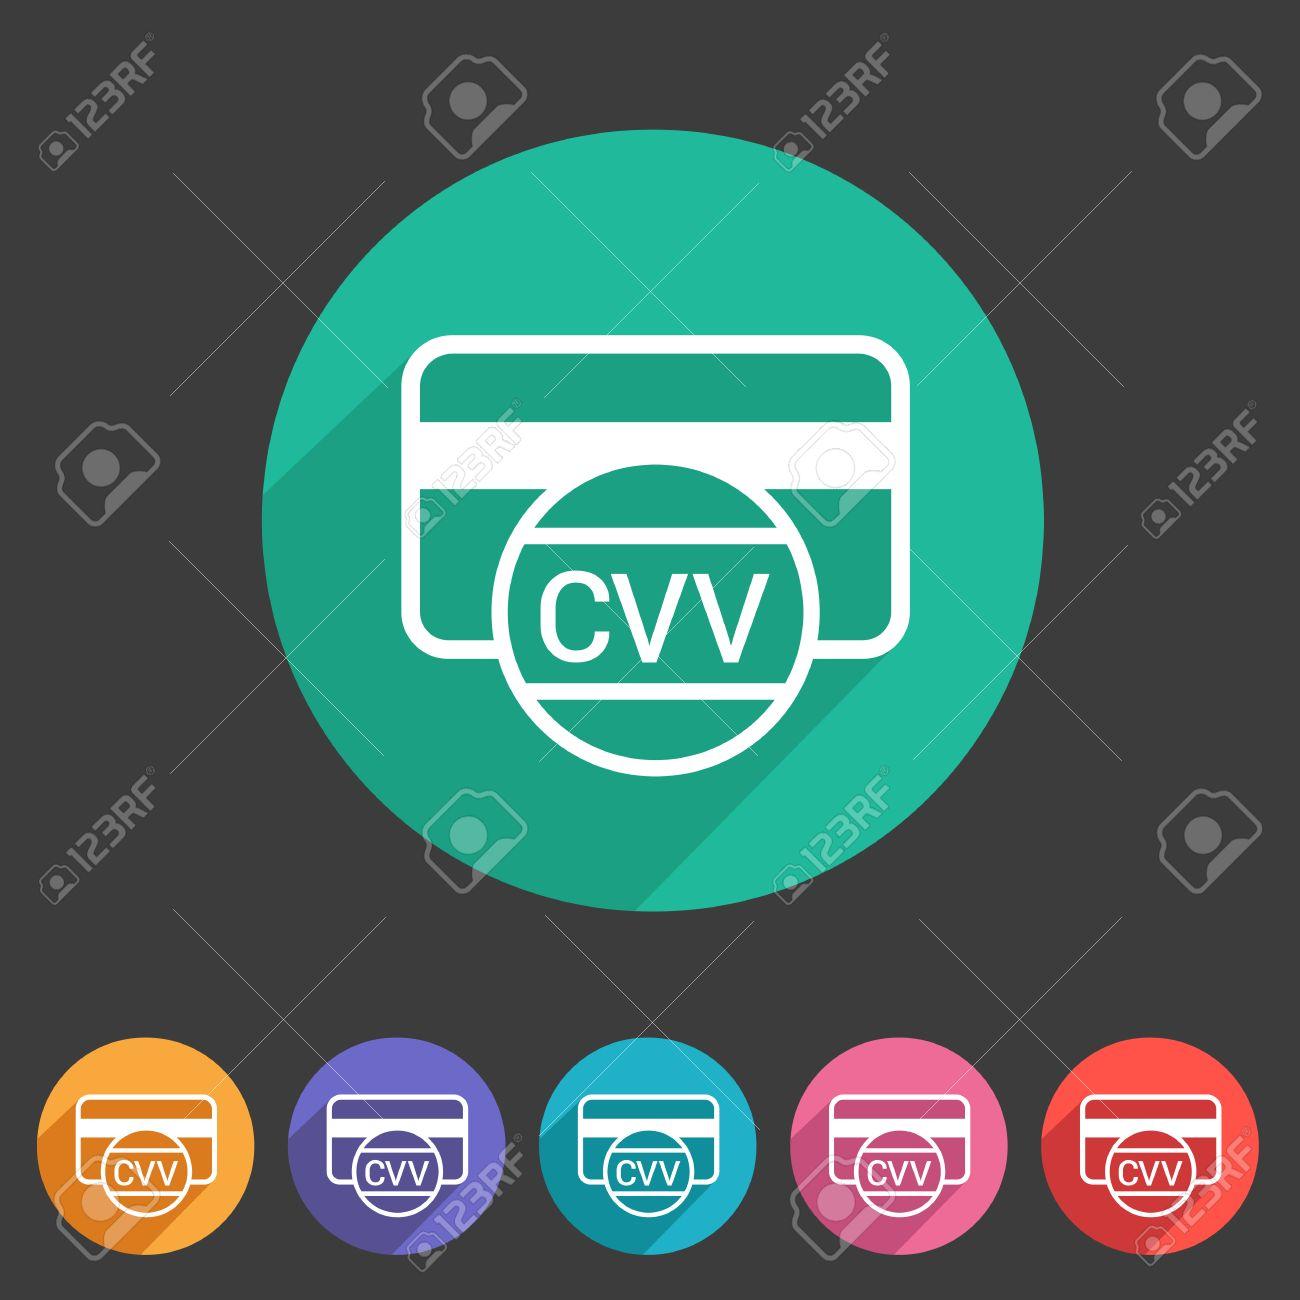 CVV card security code credit card icon flat web sign symbol